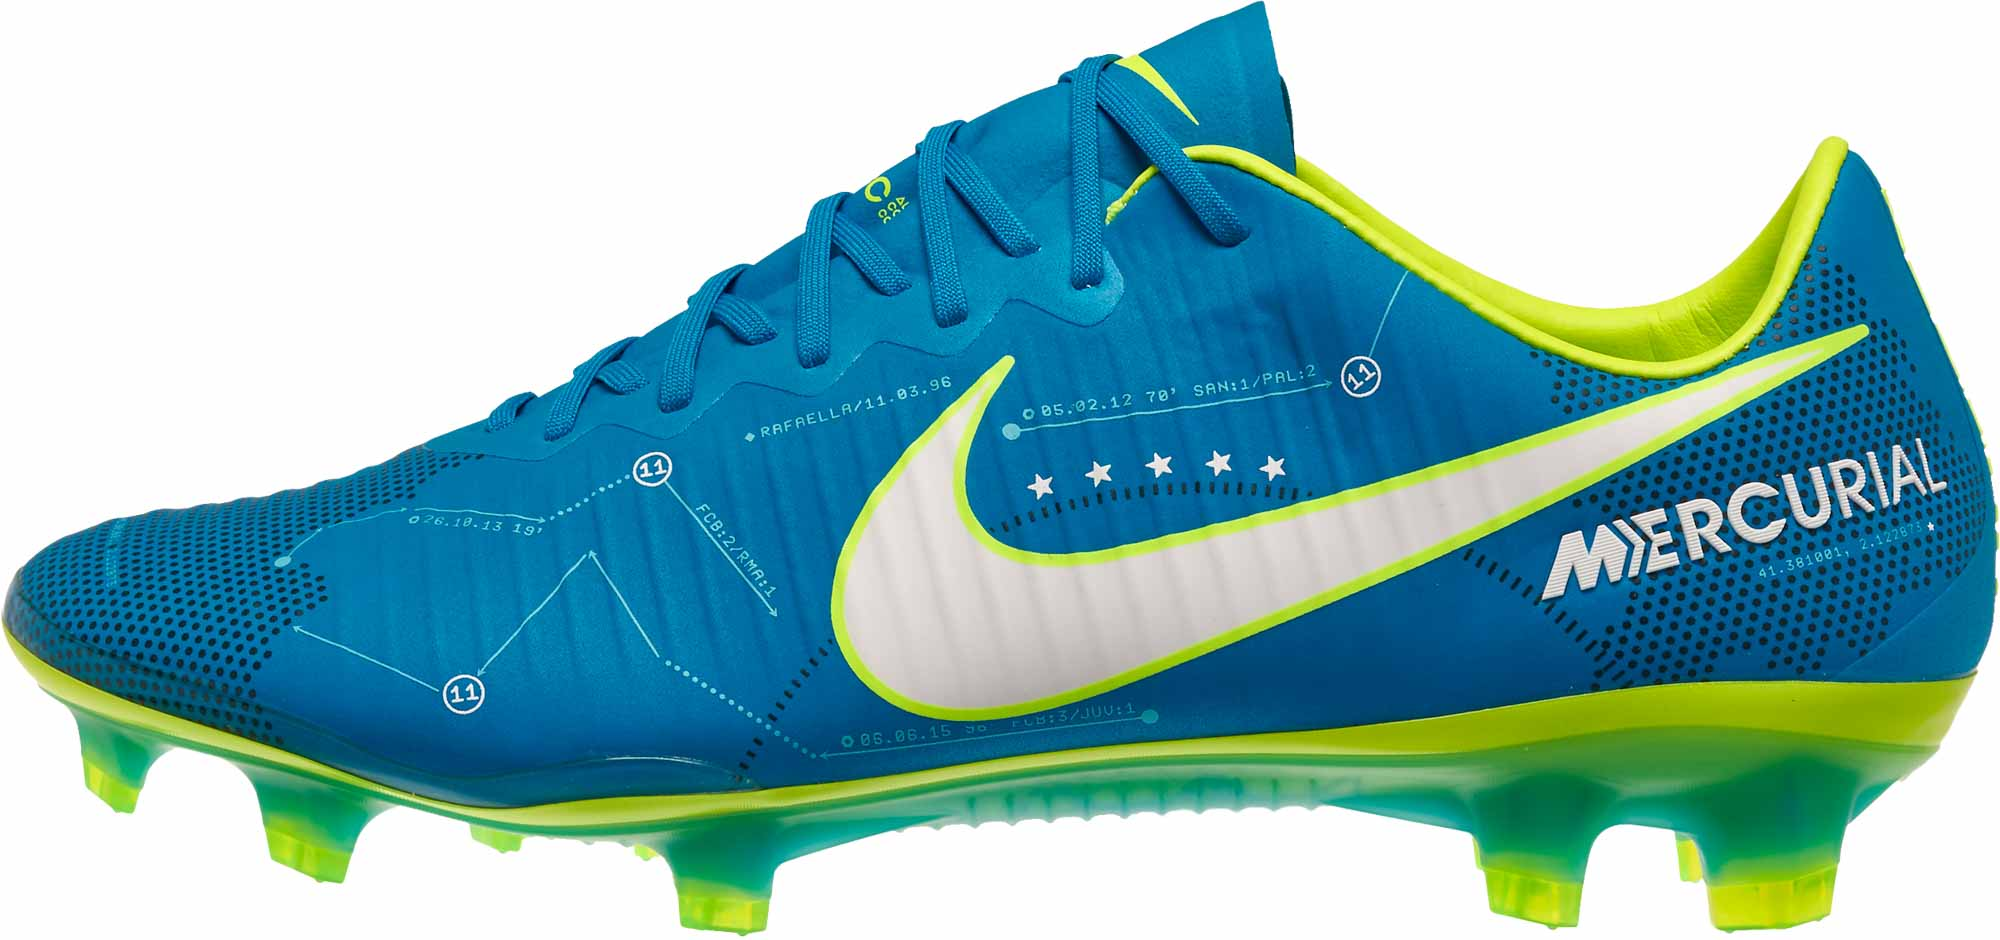 san francisco b5584 62334 Nike Mercurial Vapor XI FG - Neymar Soccer Cleats